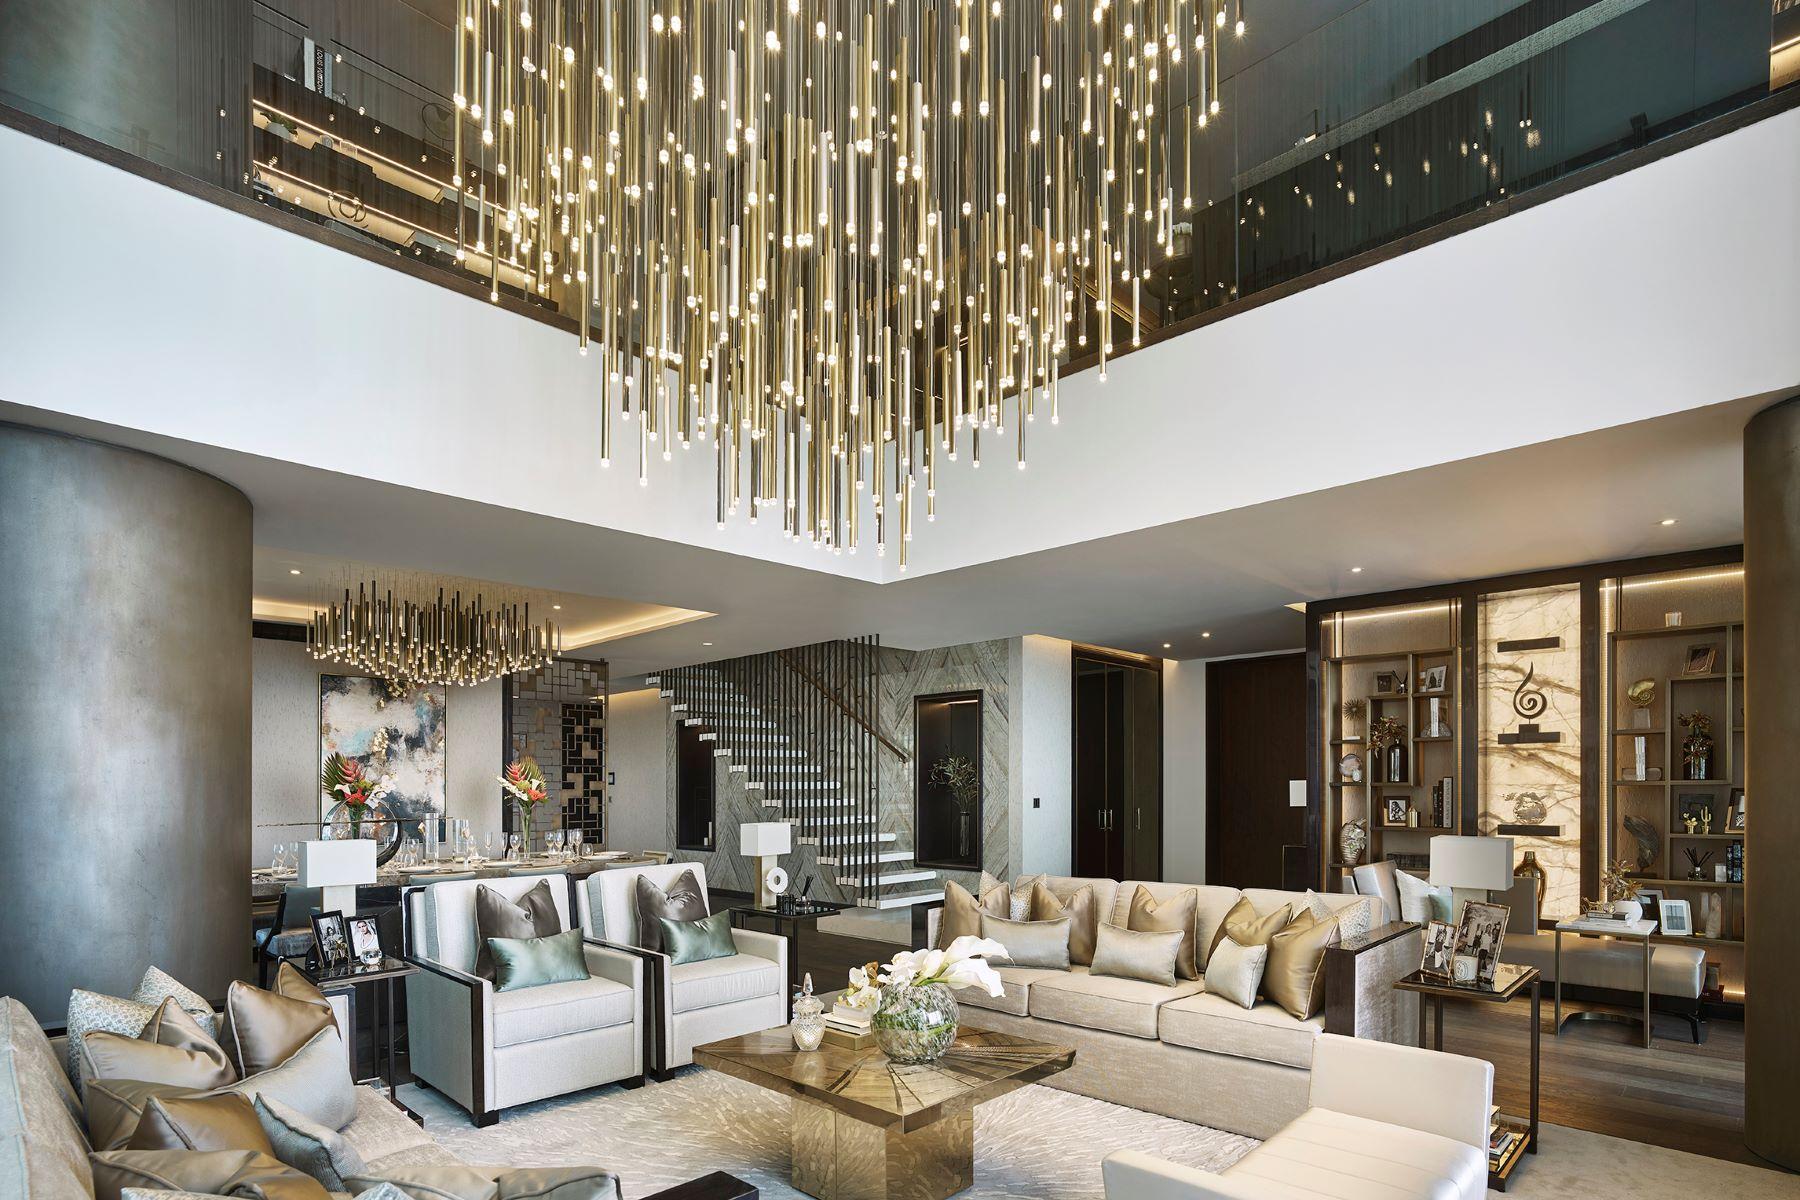 Apartments for Sale at TRIPLEX 6 BED PENTHOUSE Private Roof Top Pool. Dubai, Dubai United Arab Emirates